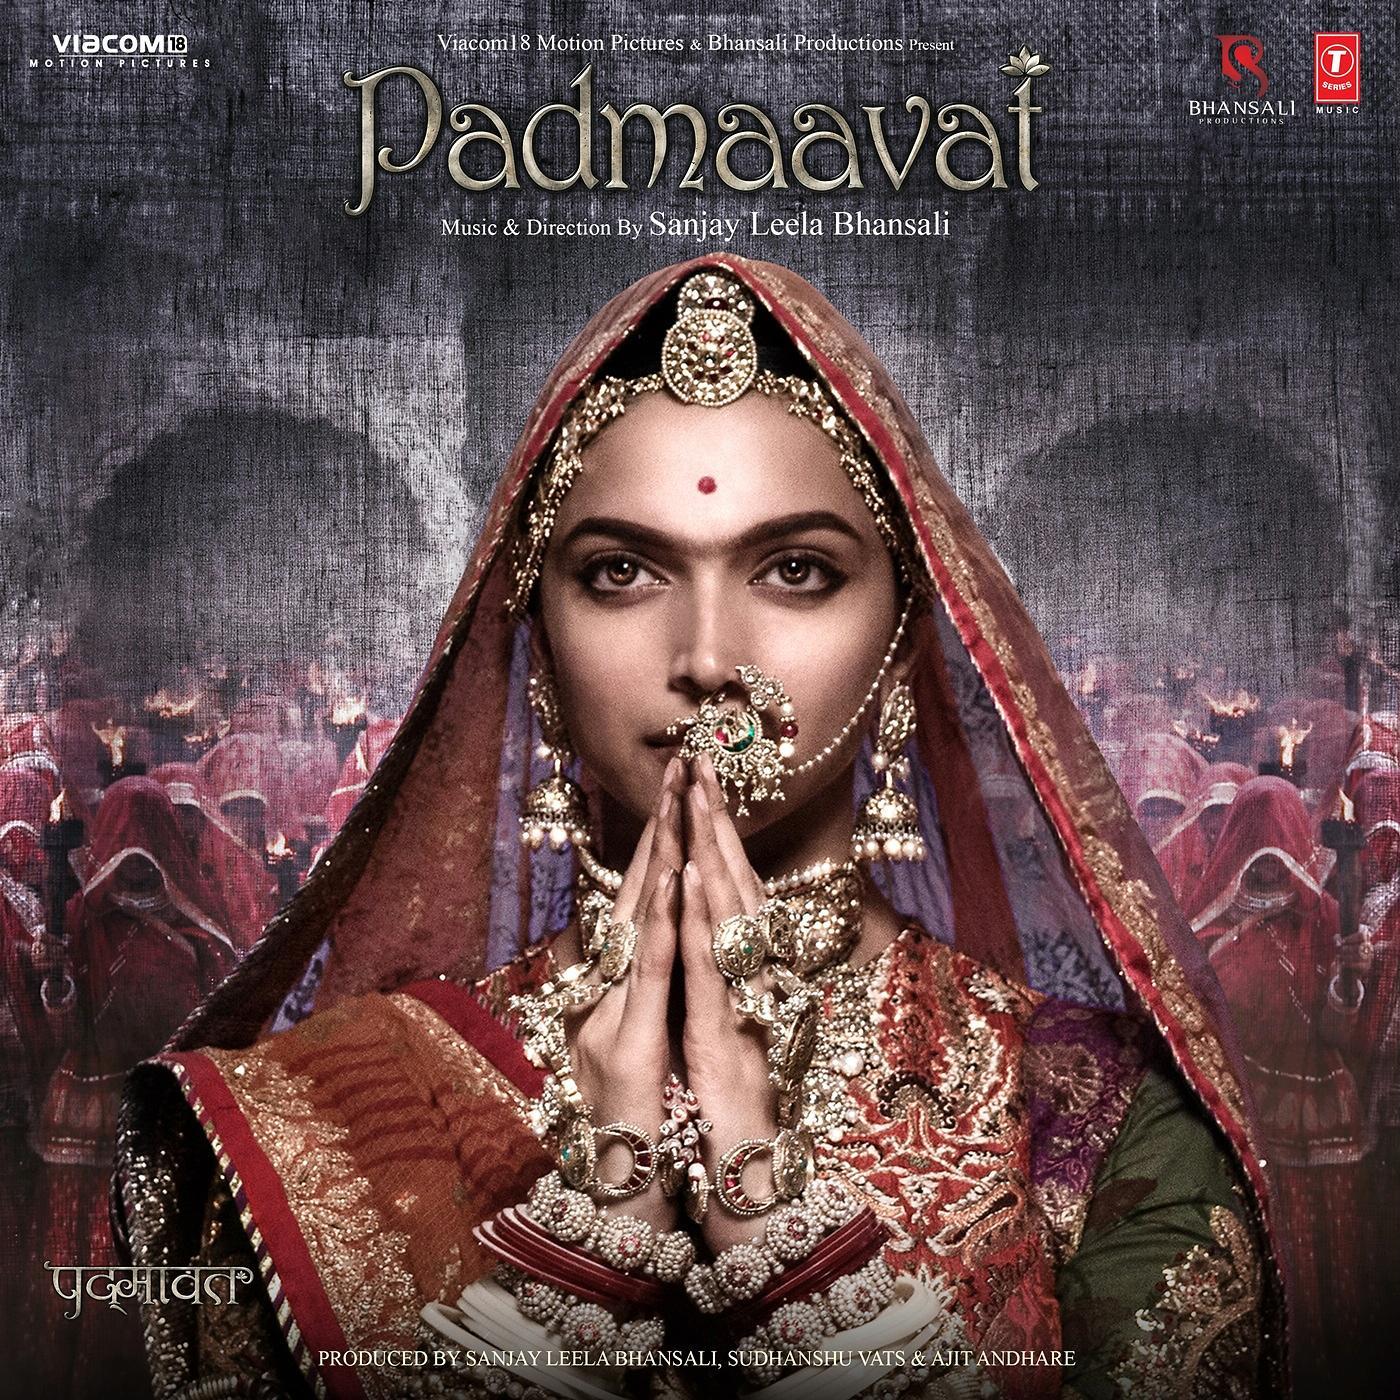 padmavati game background image